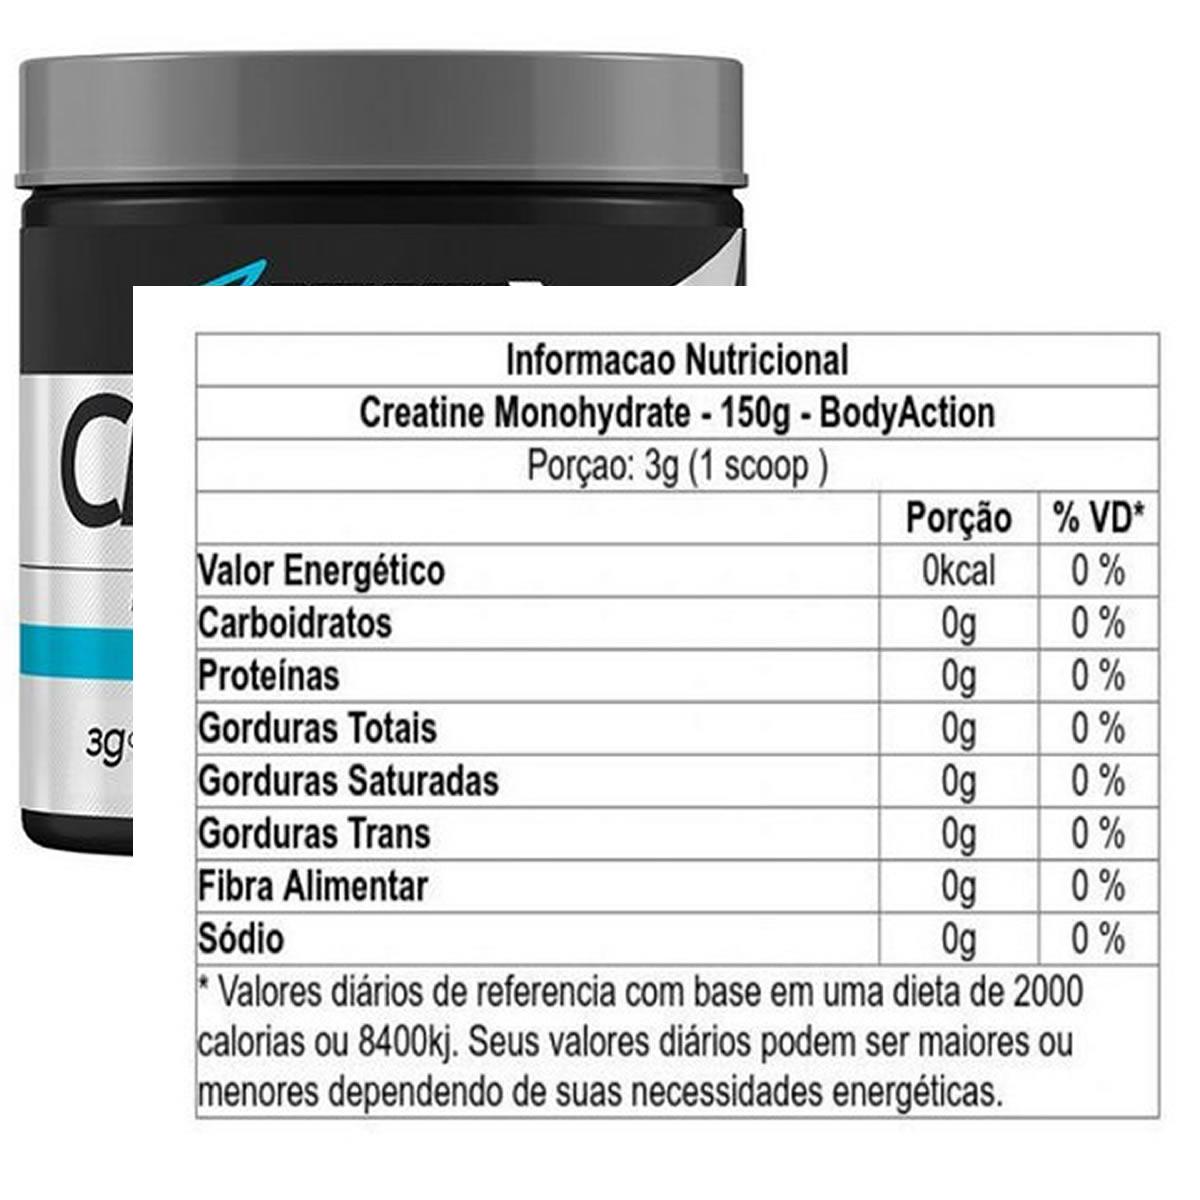 Creatine Monohydrate 150g - Body Action